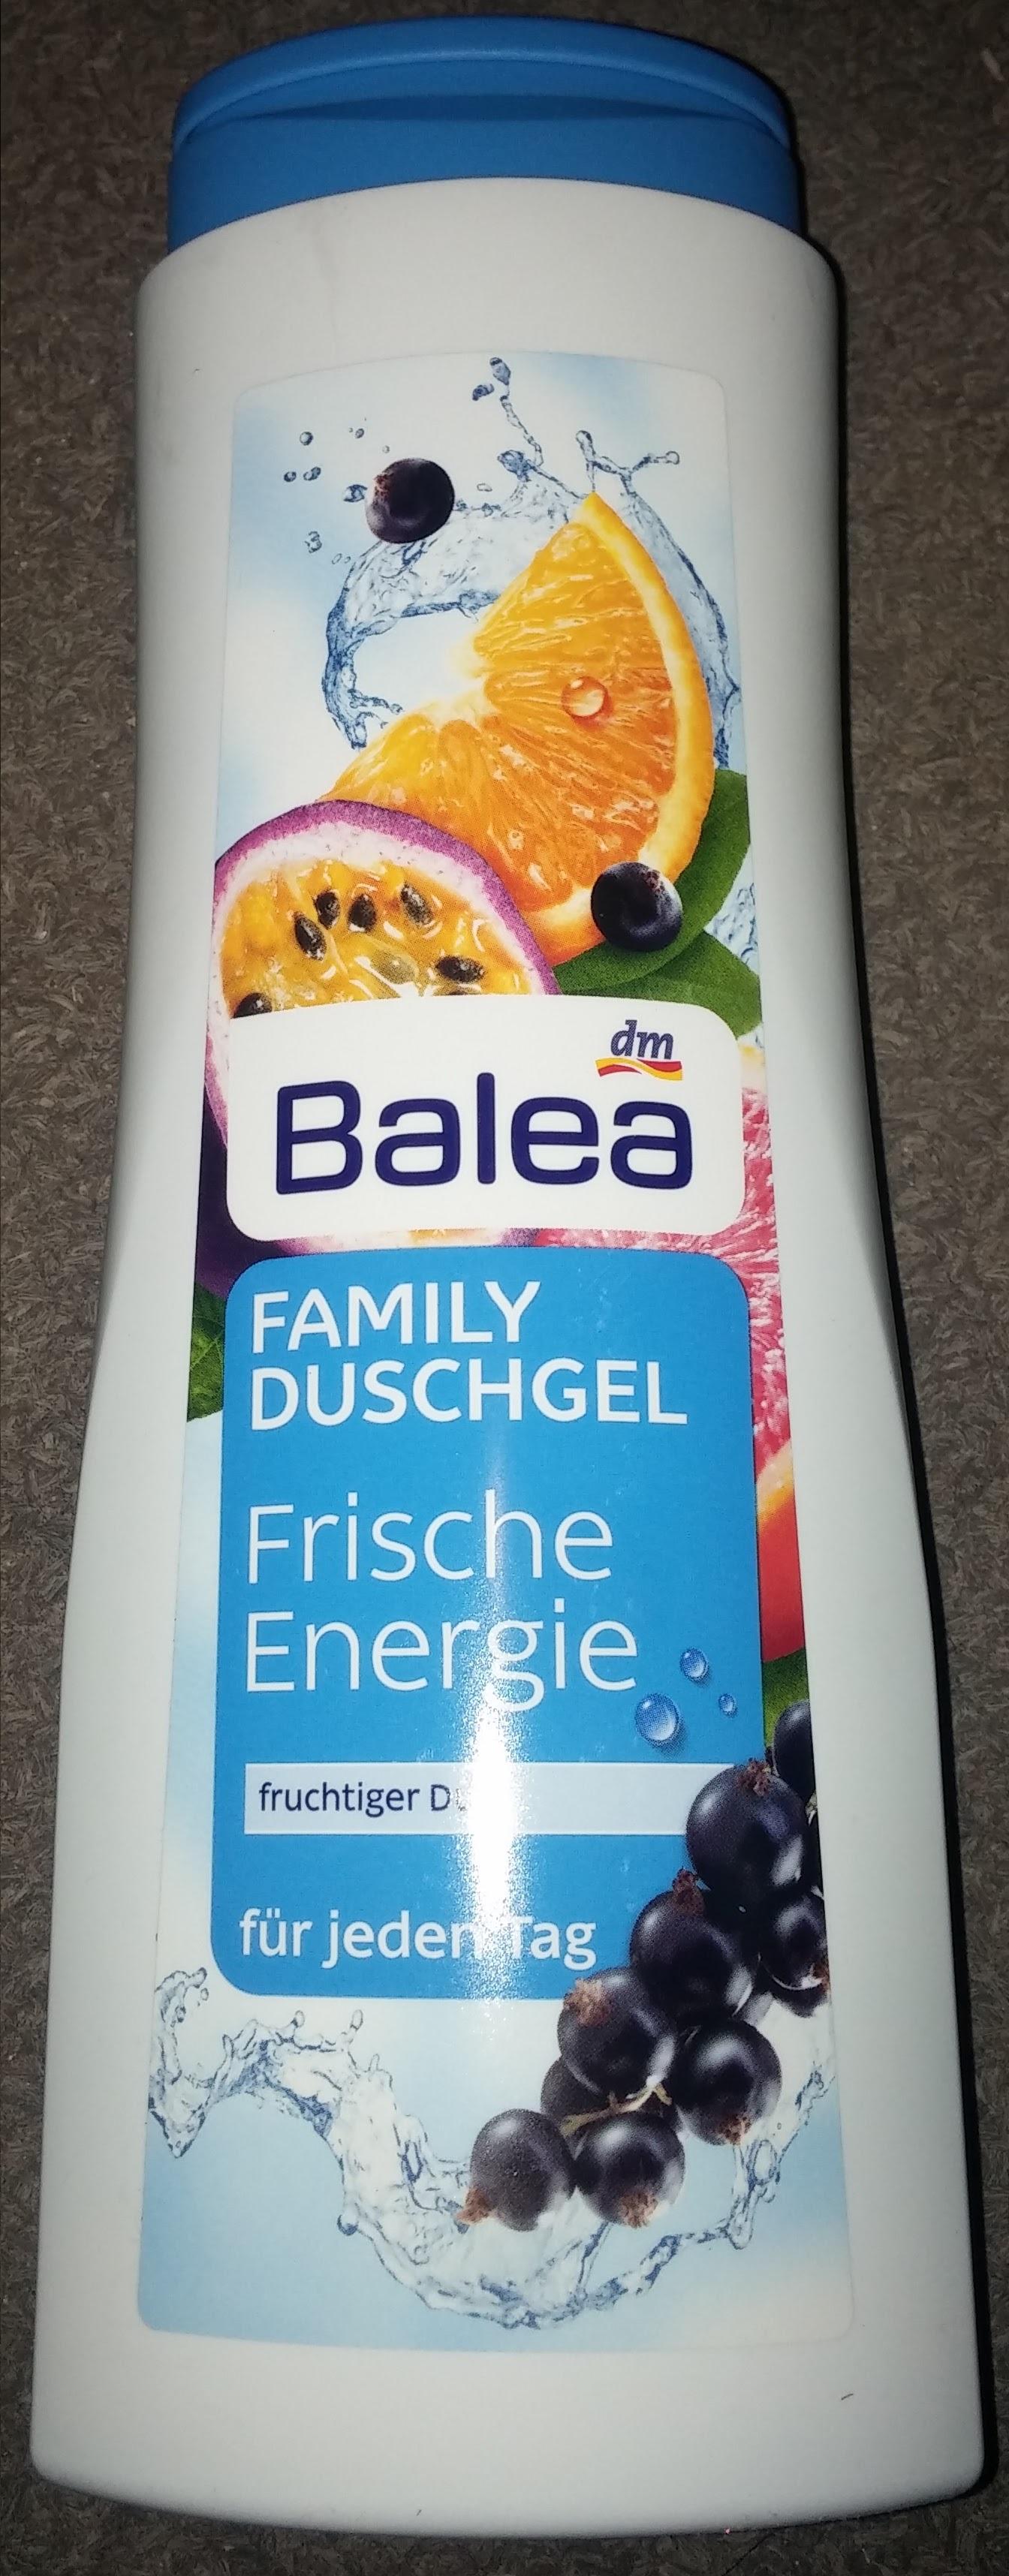 family duschgel 0.5l